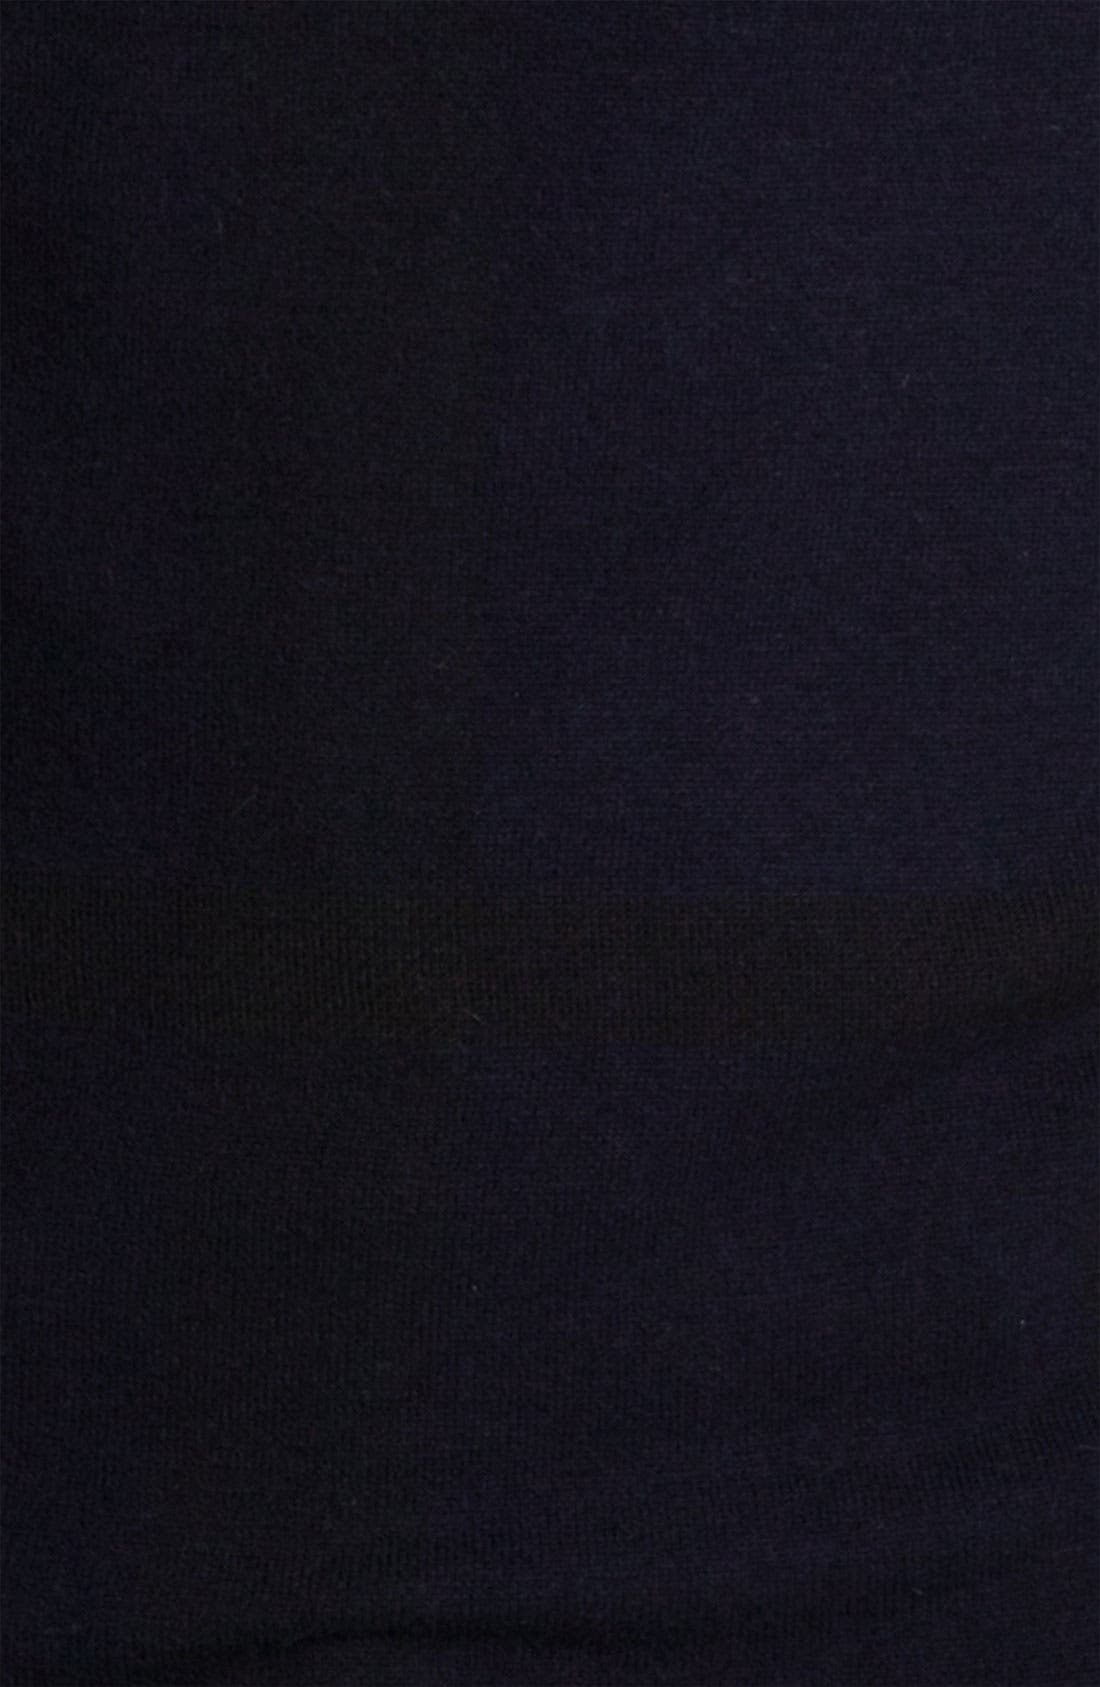 Alternate Image 3  - Burberry London Wool Blend Sweater